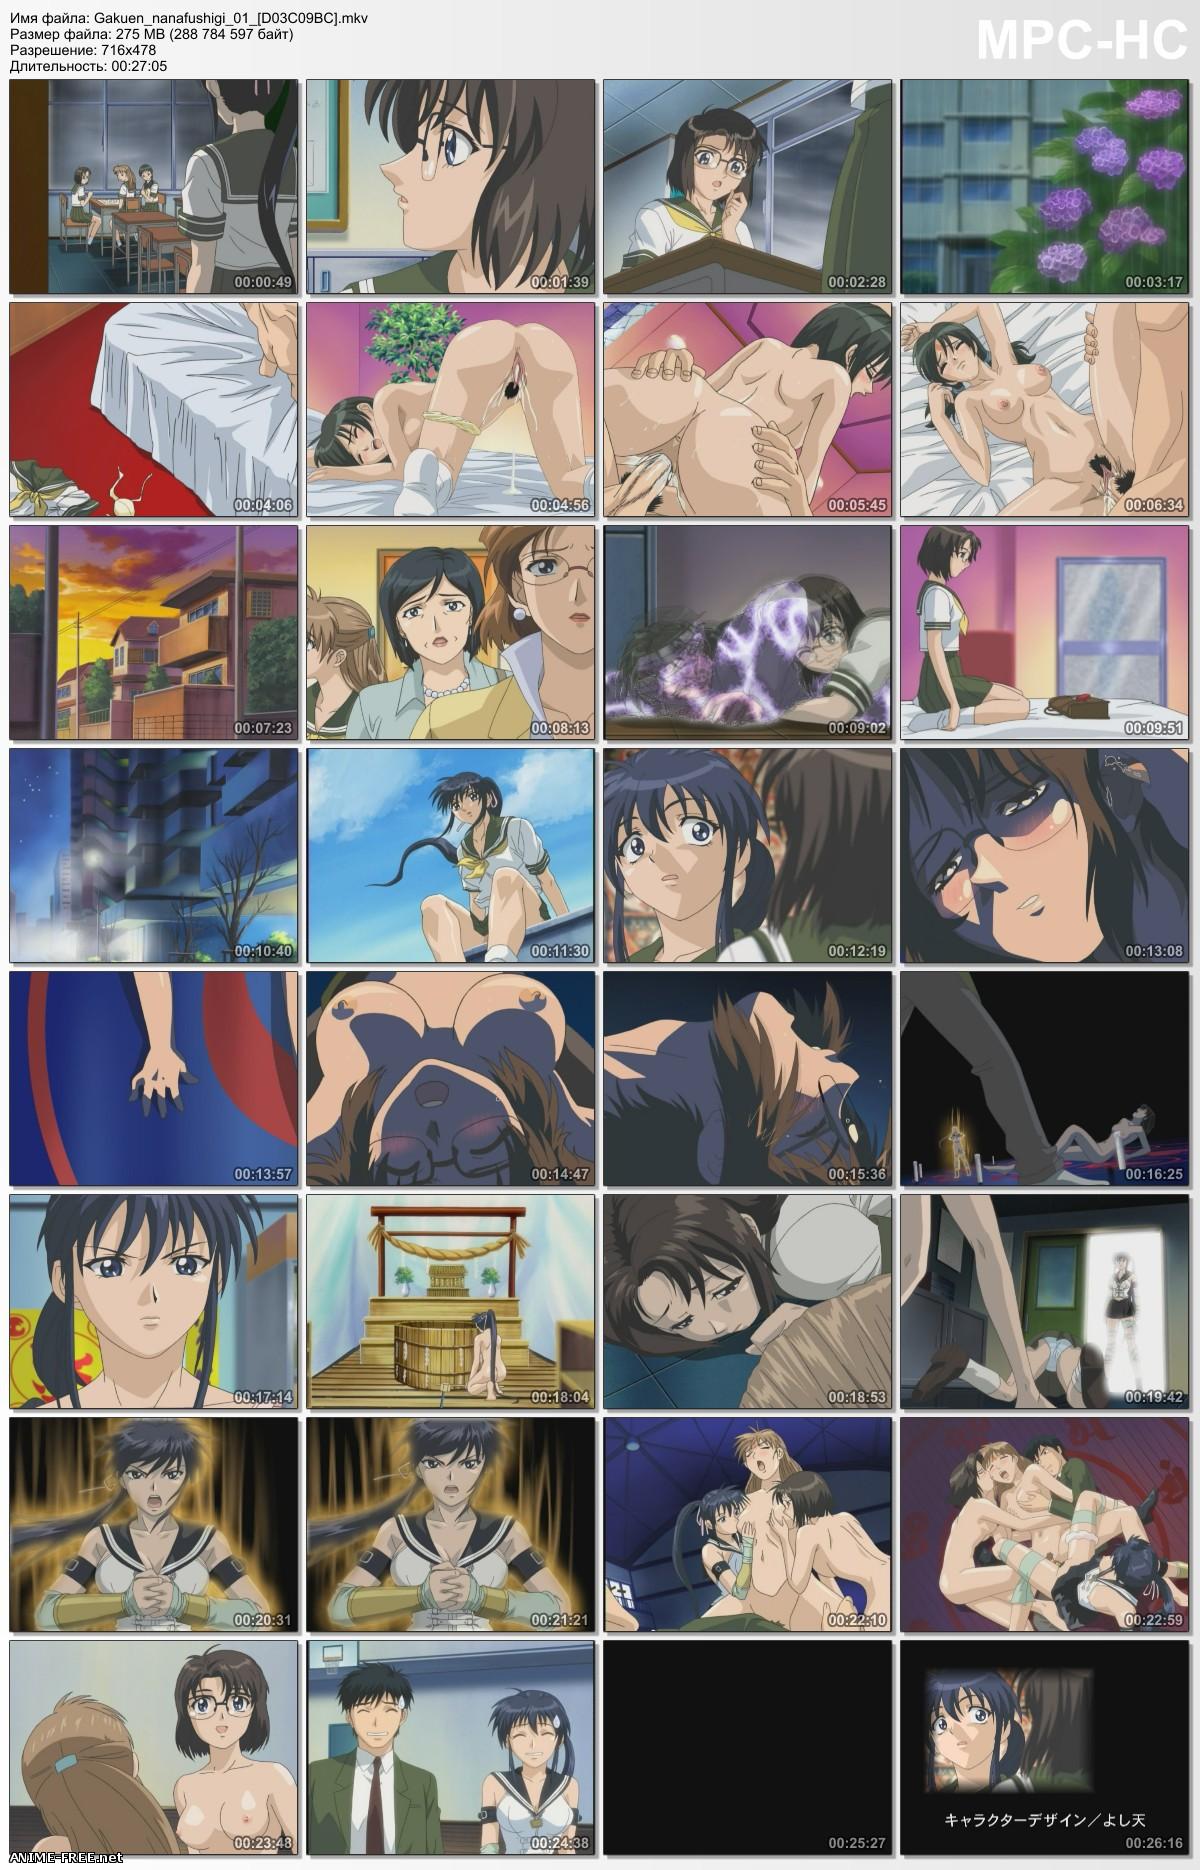 Gakuen Nanafushigi / Sex Craft / Школа семи чудес [2 из 2] [RUS,ENG,JAP] Anime Hentai